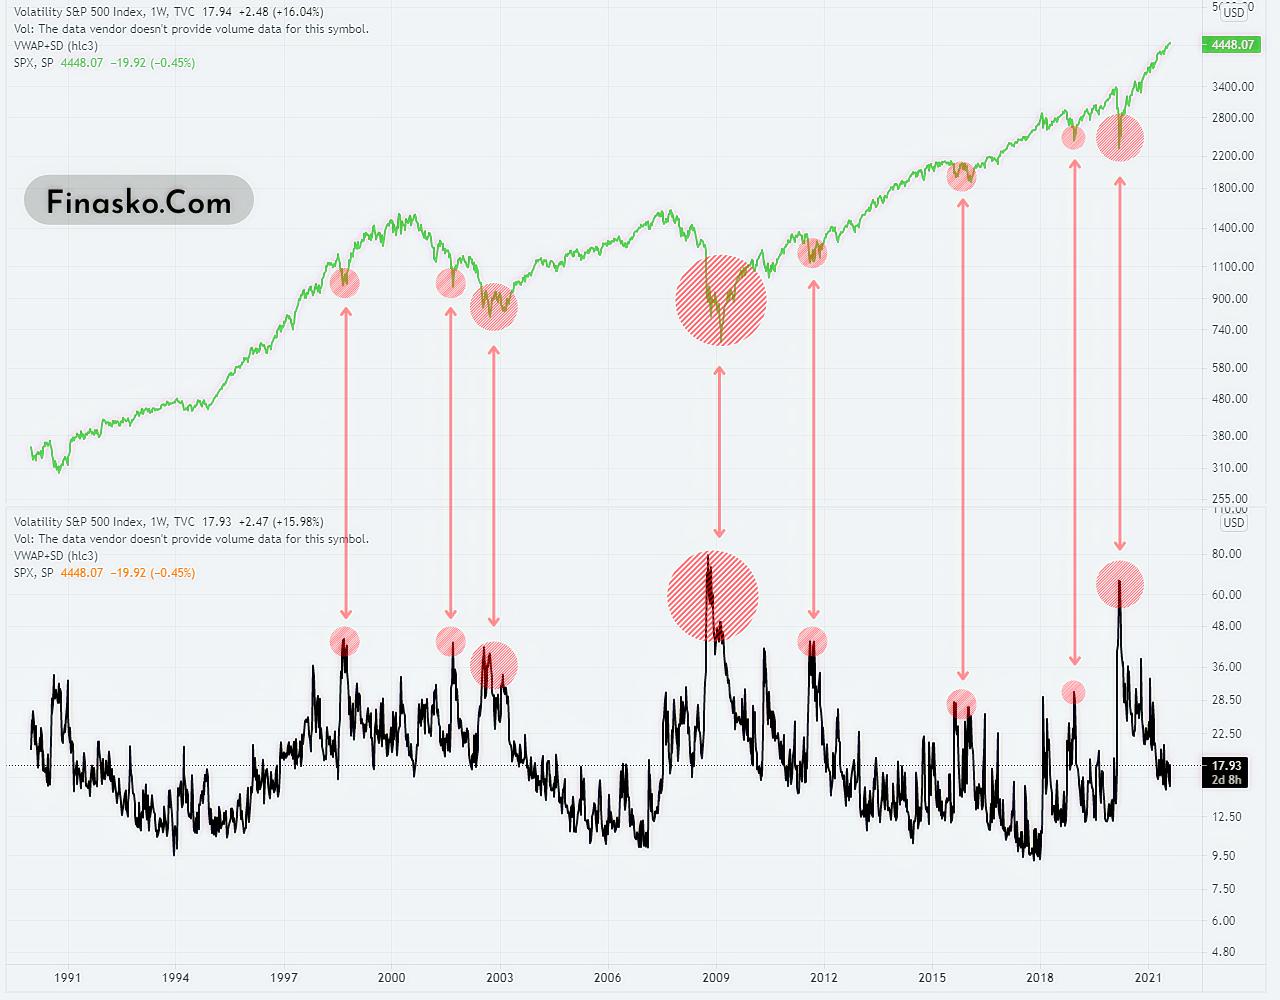 VIX vs S&P 500